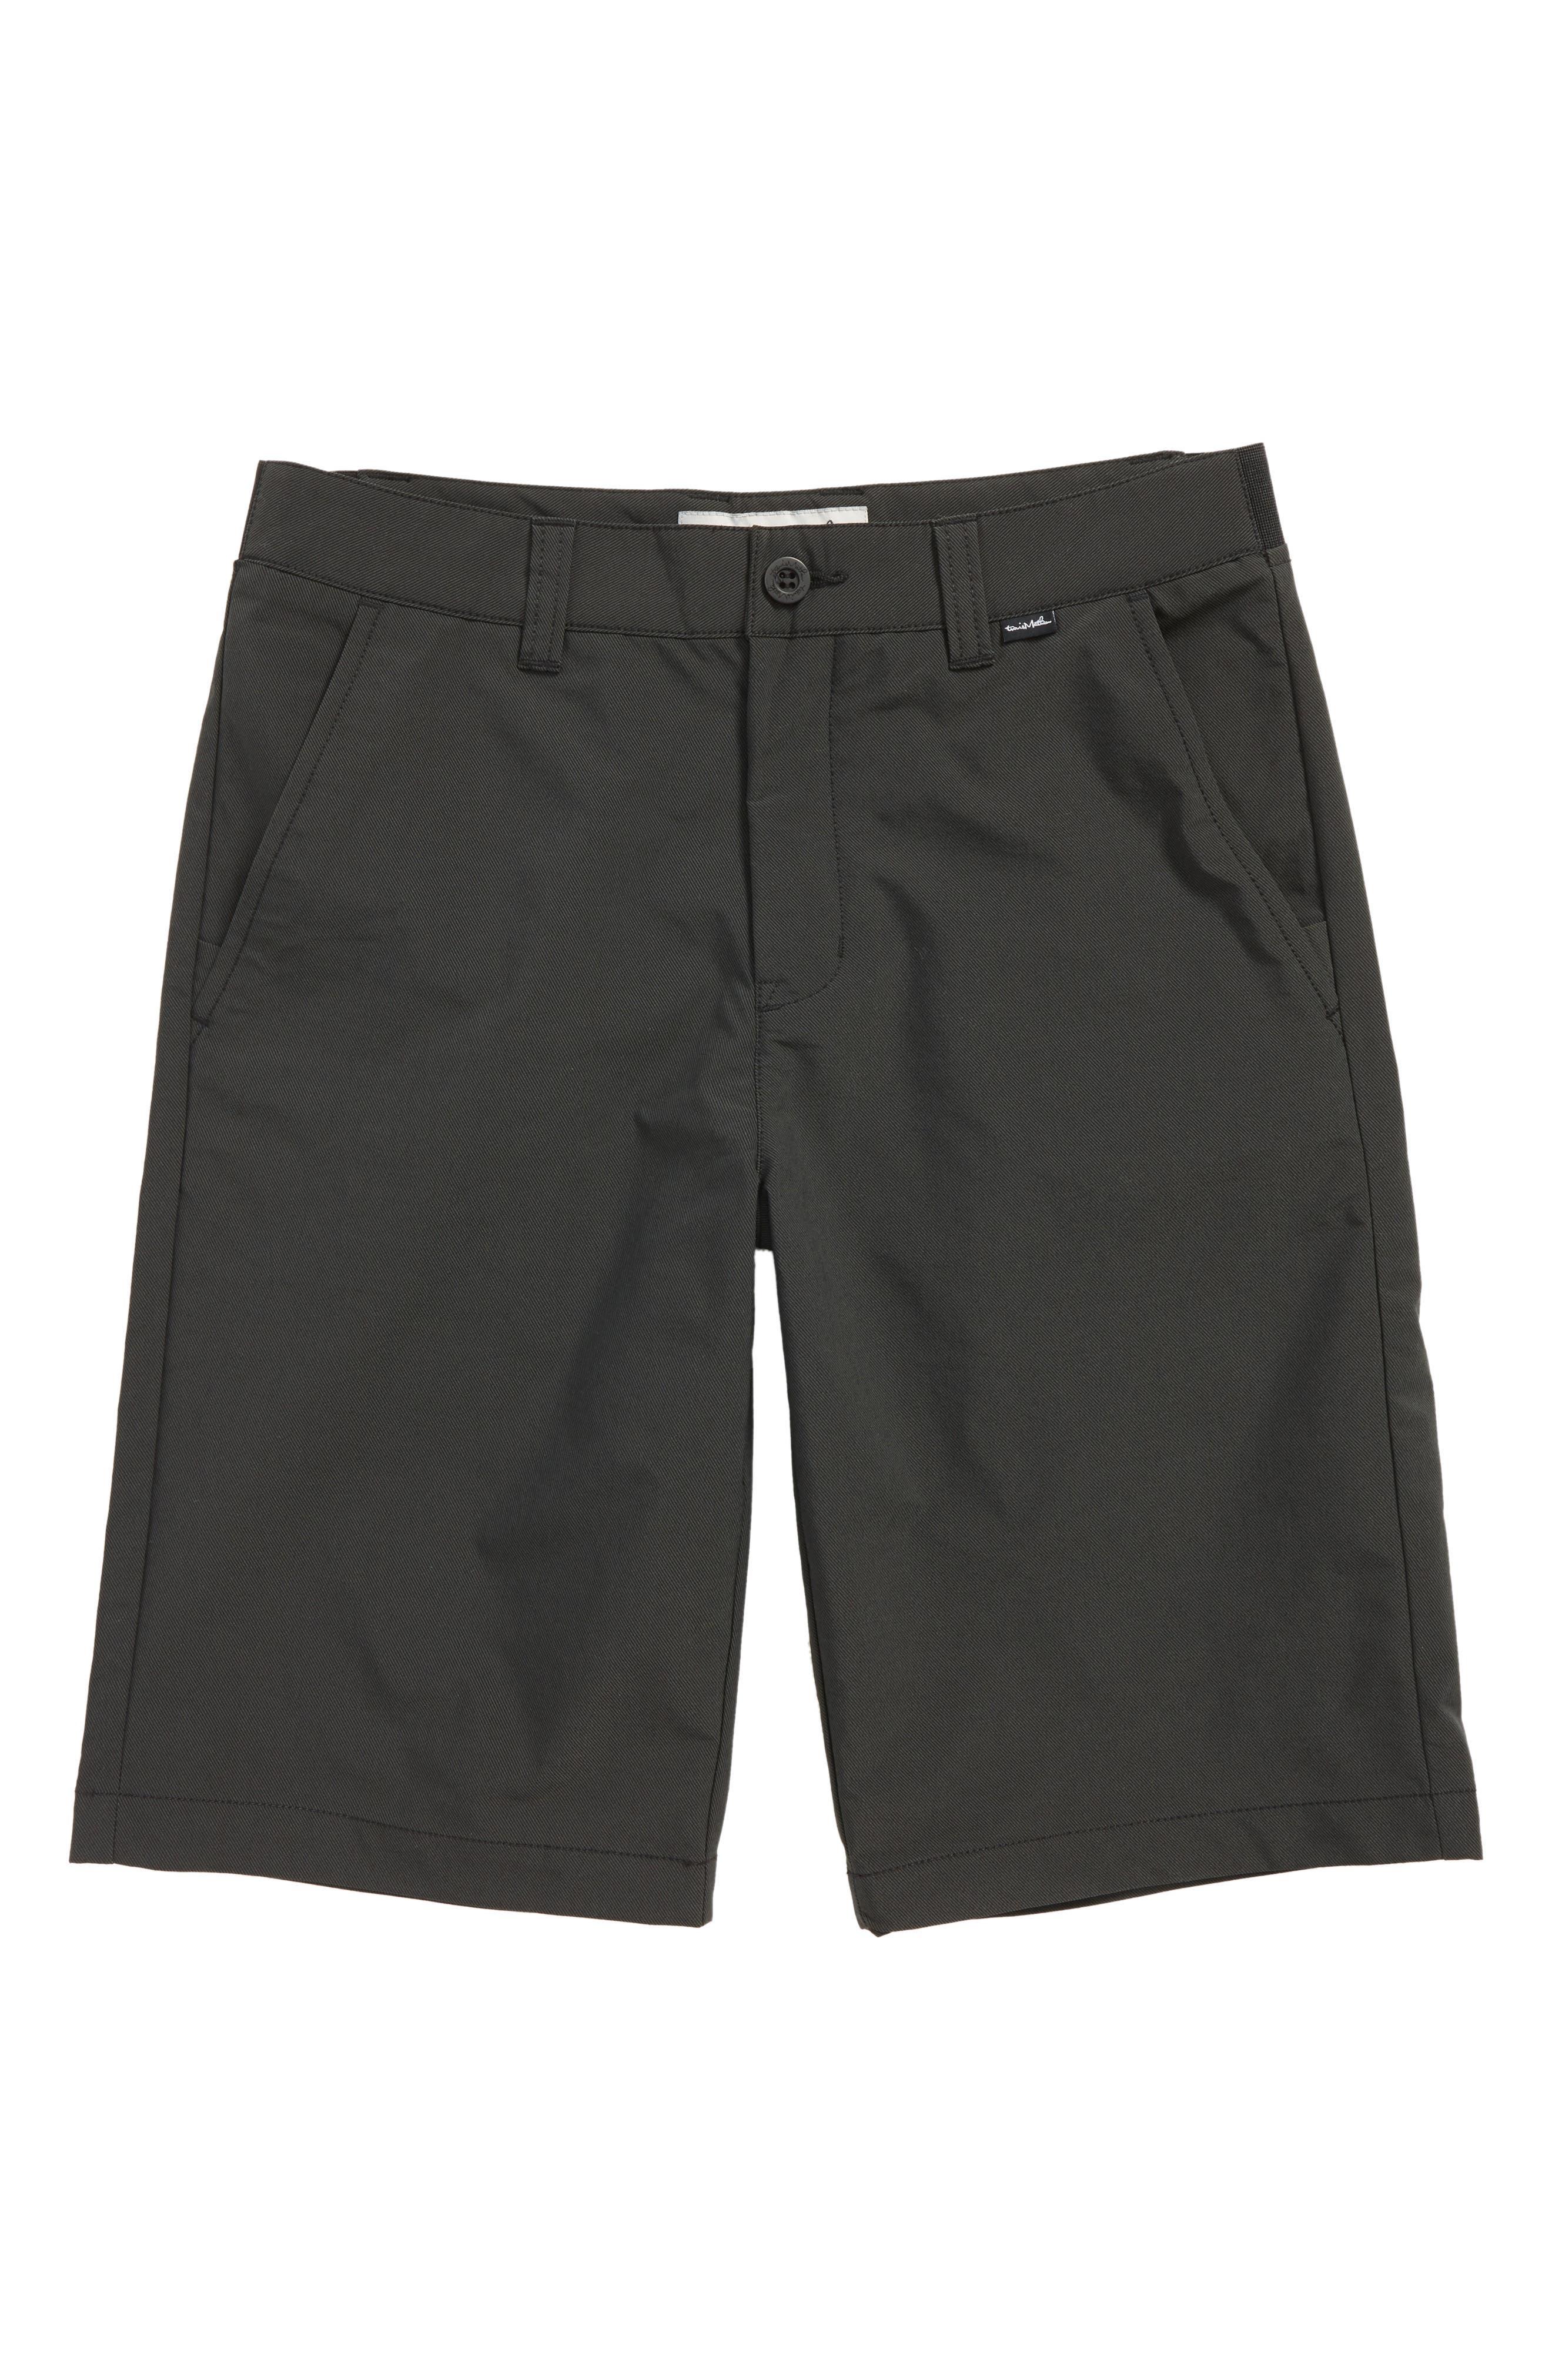 Hef Flex Shorts,                             Main thumbnail 1, color,                             Black